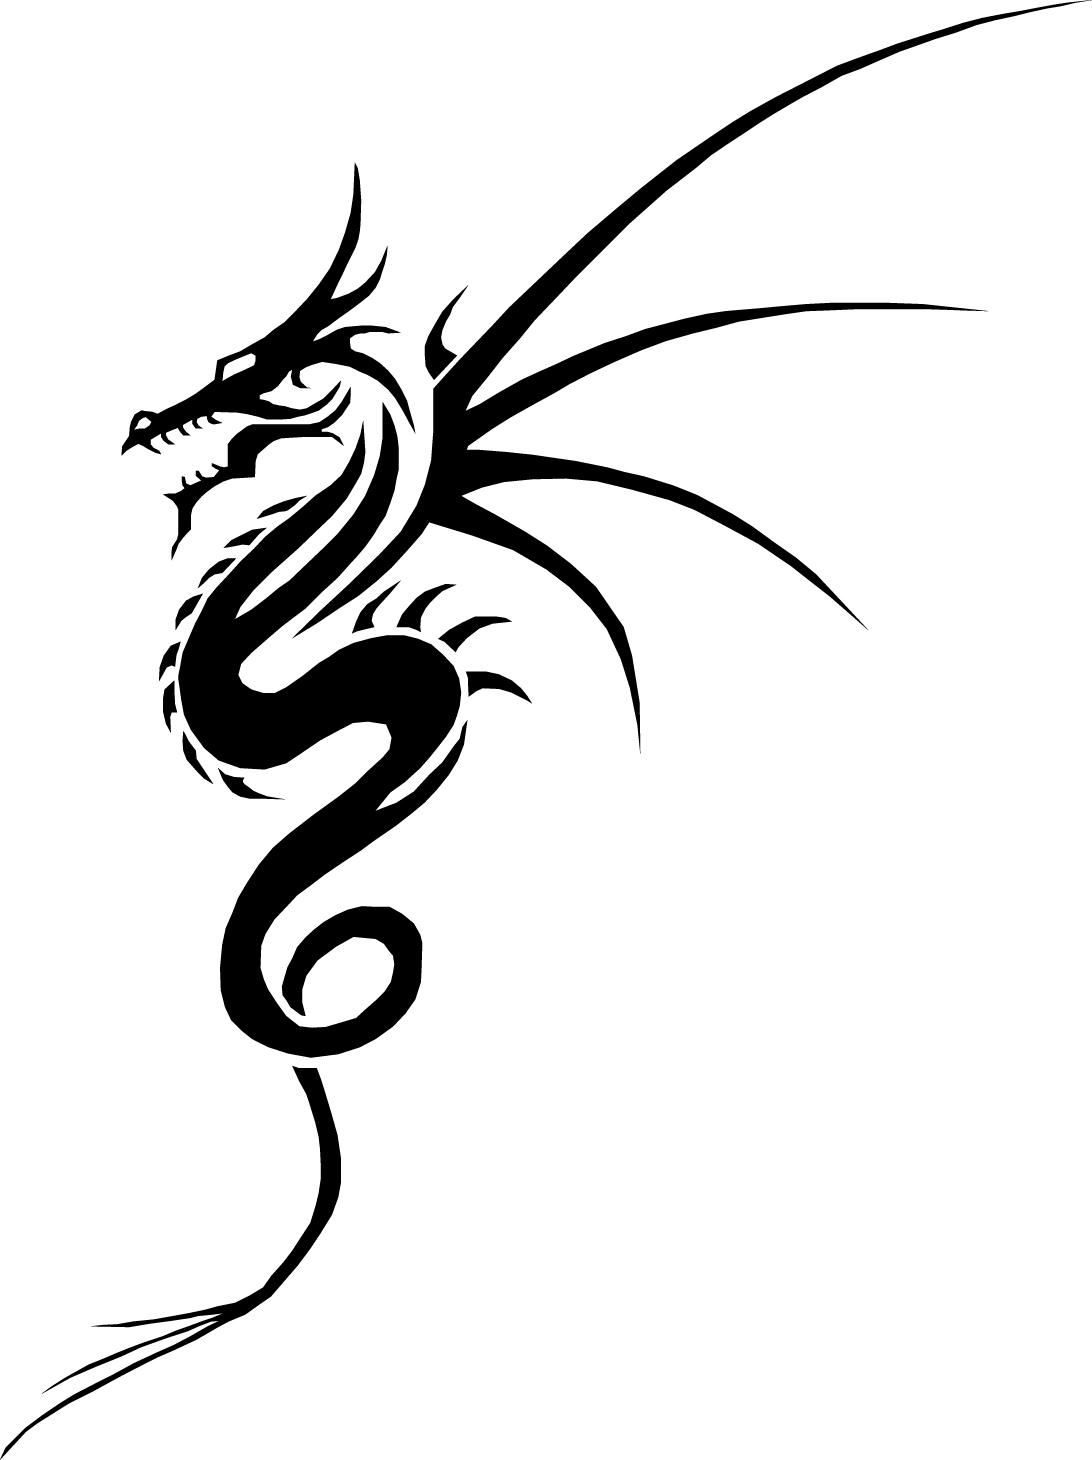 Simple Black Tribal Dragon Tattoo Design